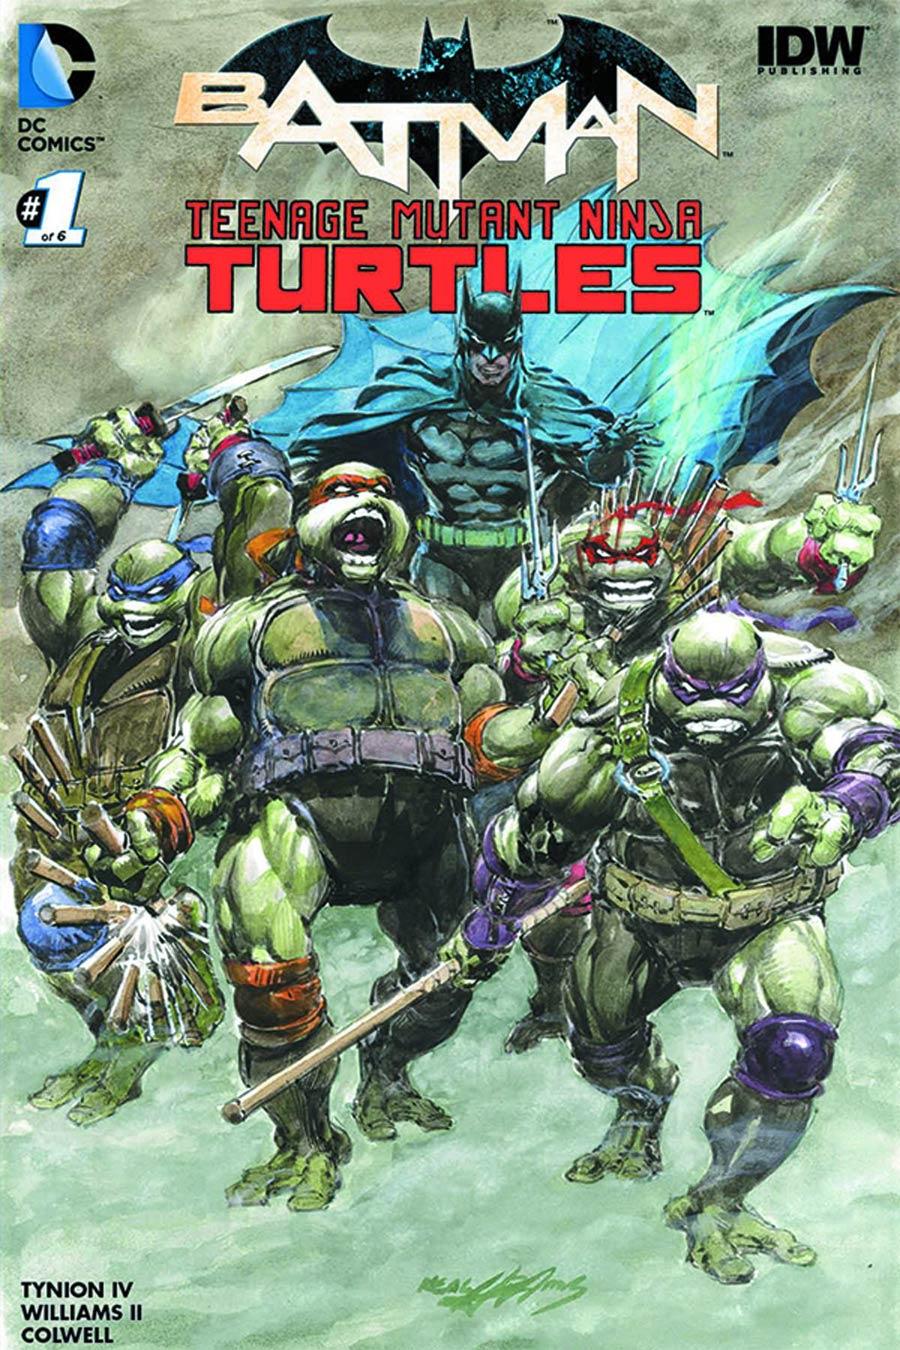 Batman Teenage Mutant Ninja Turtles #1 Cover H DF Exclusive Neal Adams Color Variant Cover CGC Graded